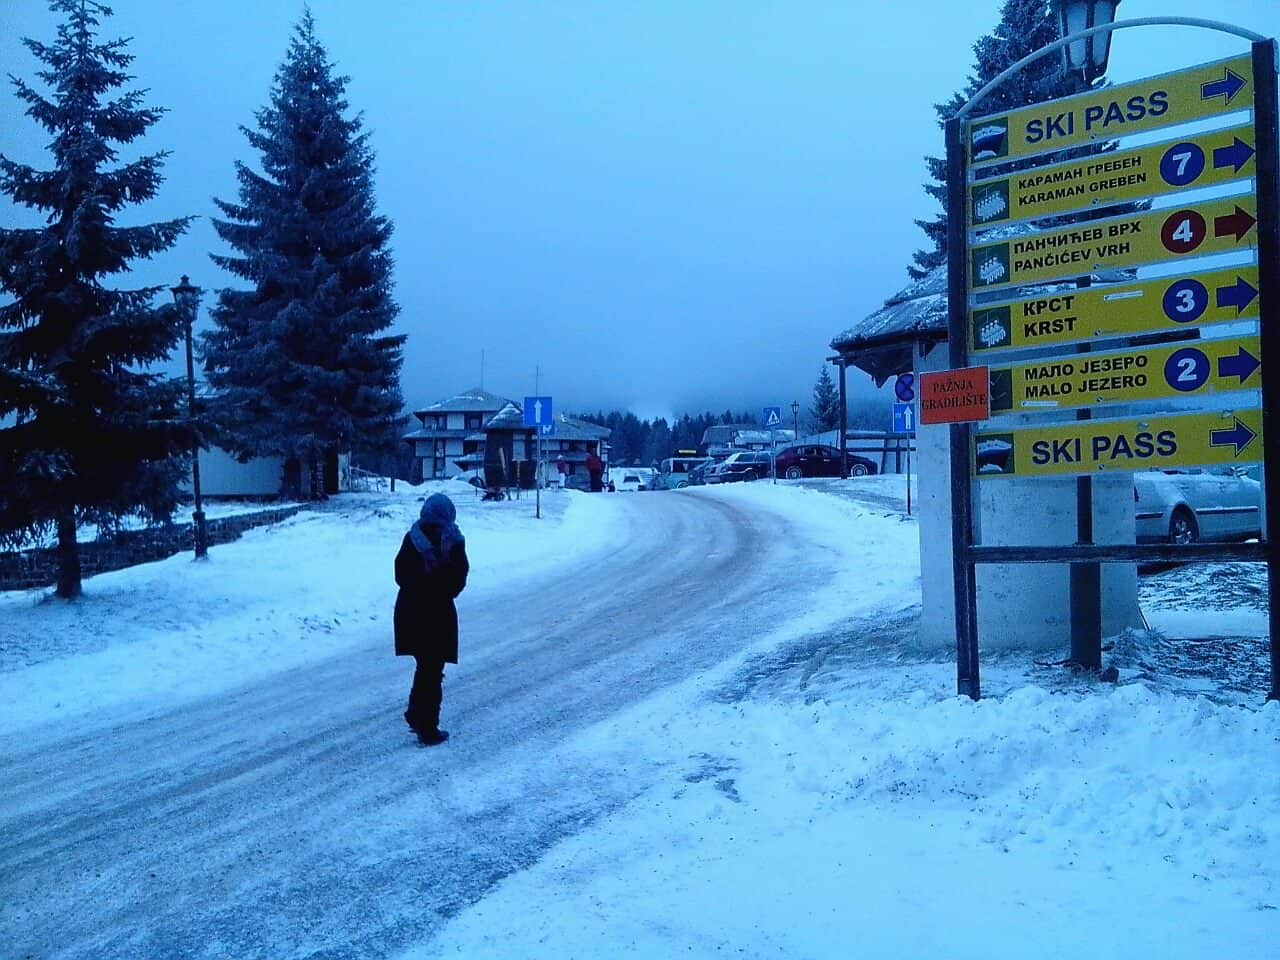 Izveštaj sa Kopaonika: Na Kopaoniku danas (21.12.2014.god) pada slab sneg, brzna vetra 4 m/s, visina snežnog pokrivača van staza 3 cm, temperatura -5 C,